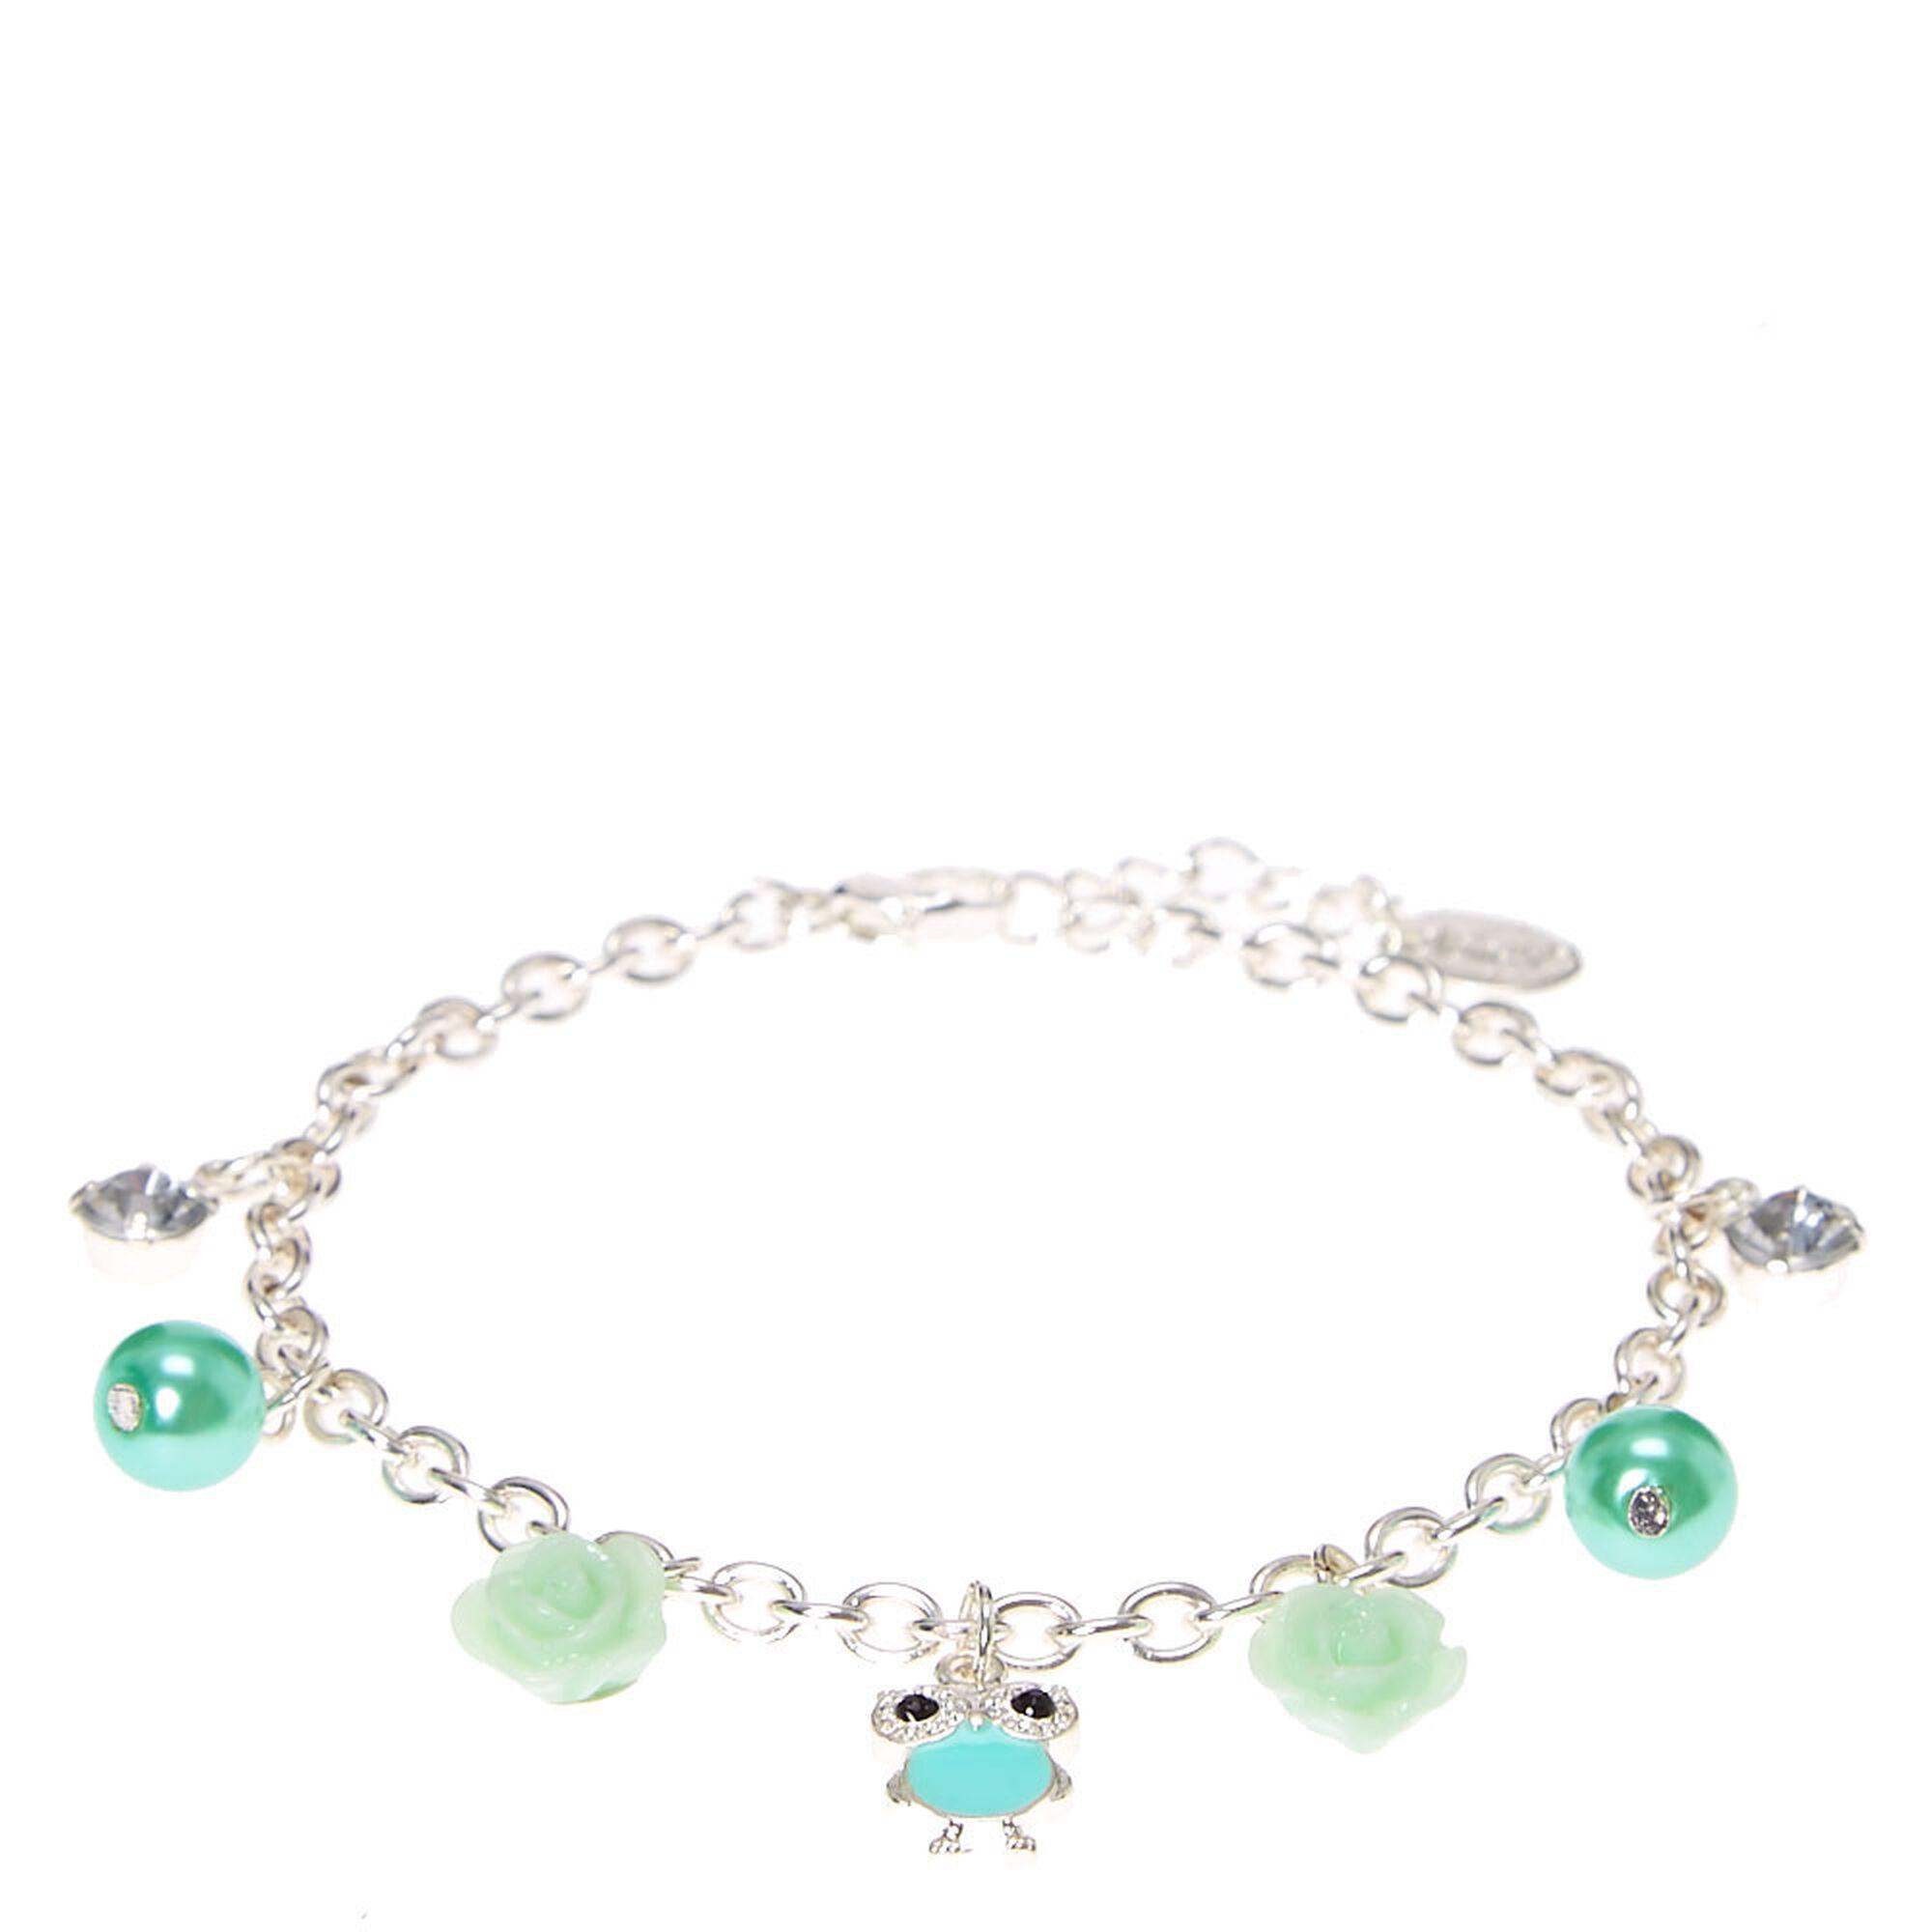 Mint Green Carved Rose And Owl Charm Bracelet,